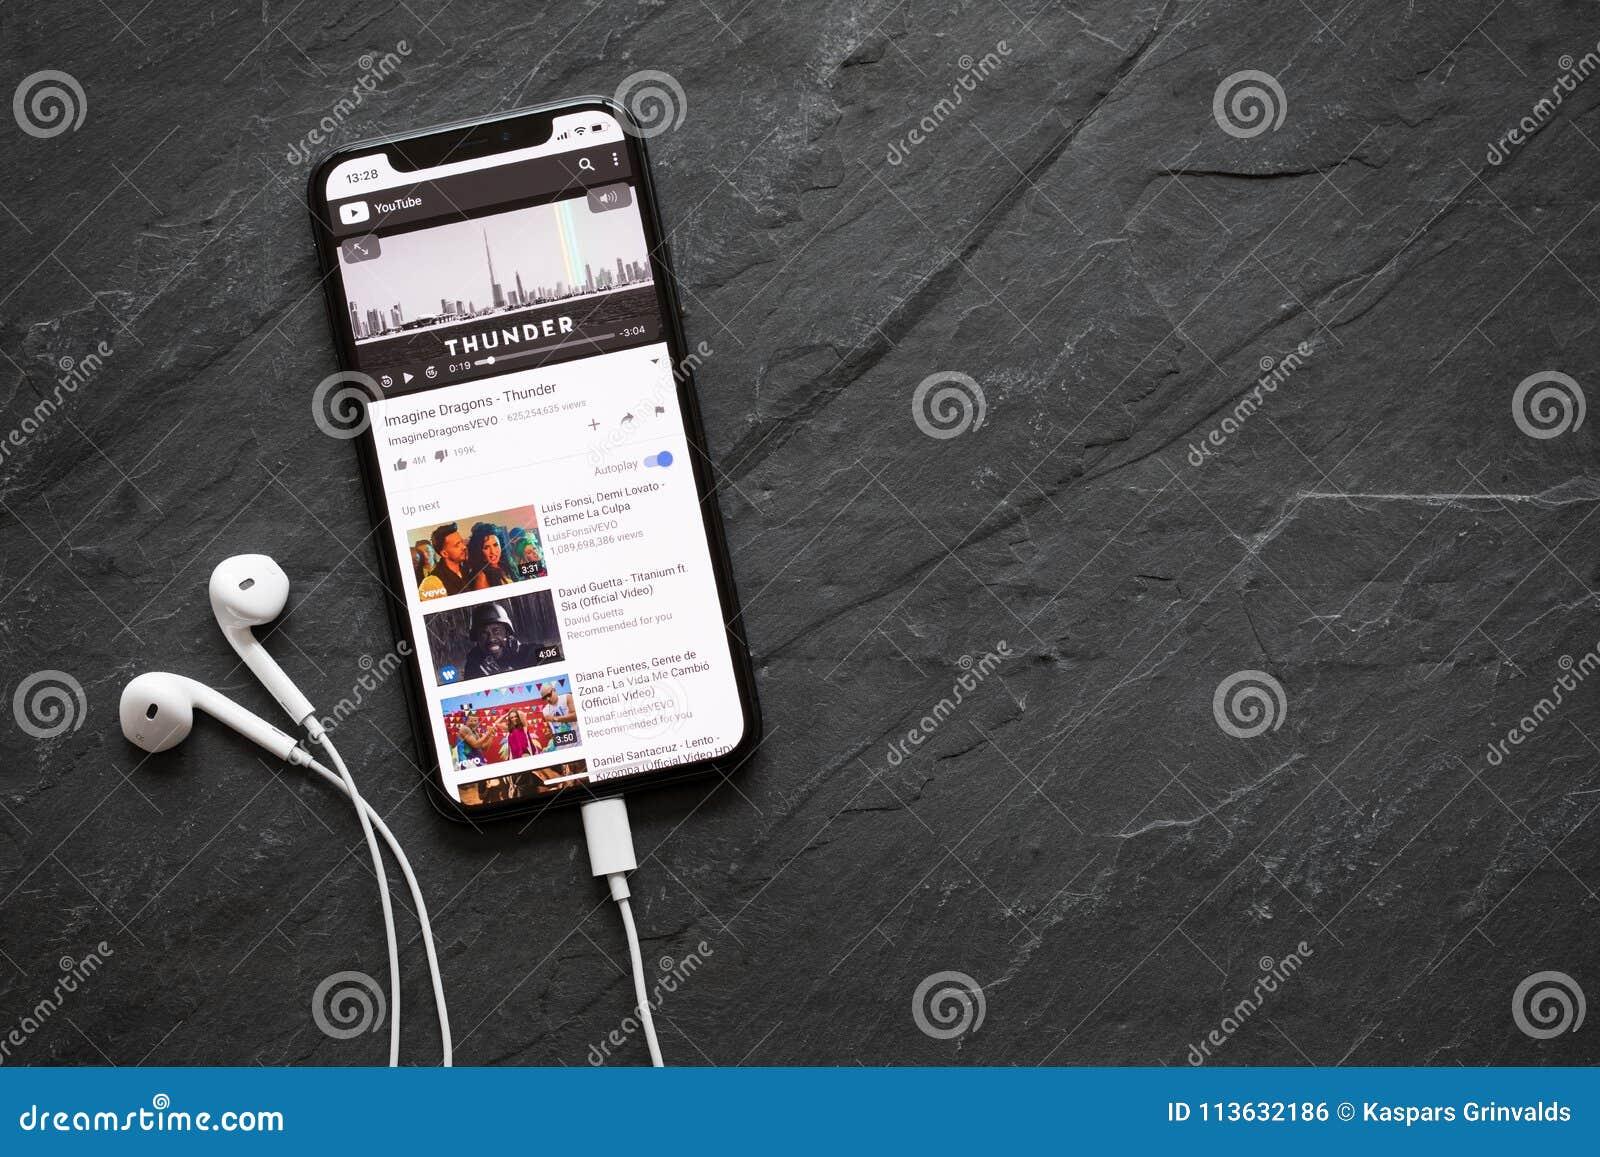 descargar video youtube iphone x